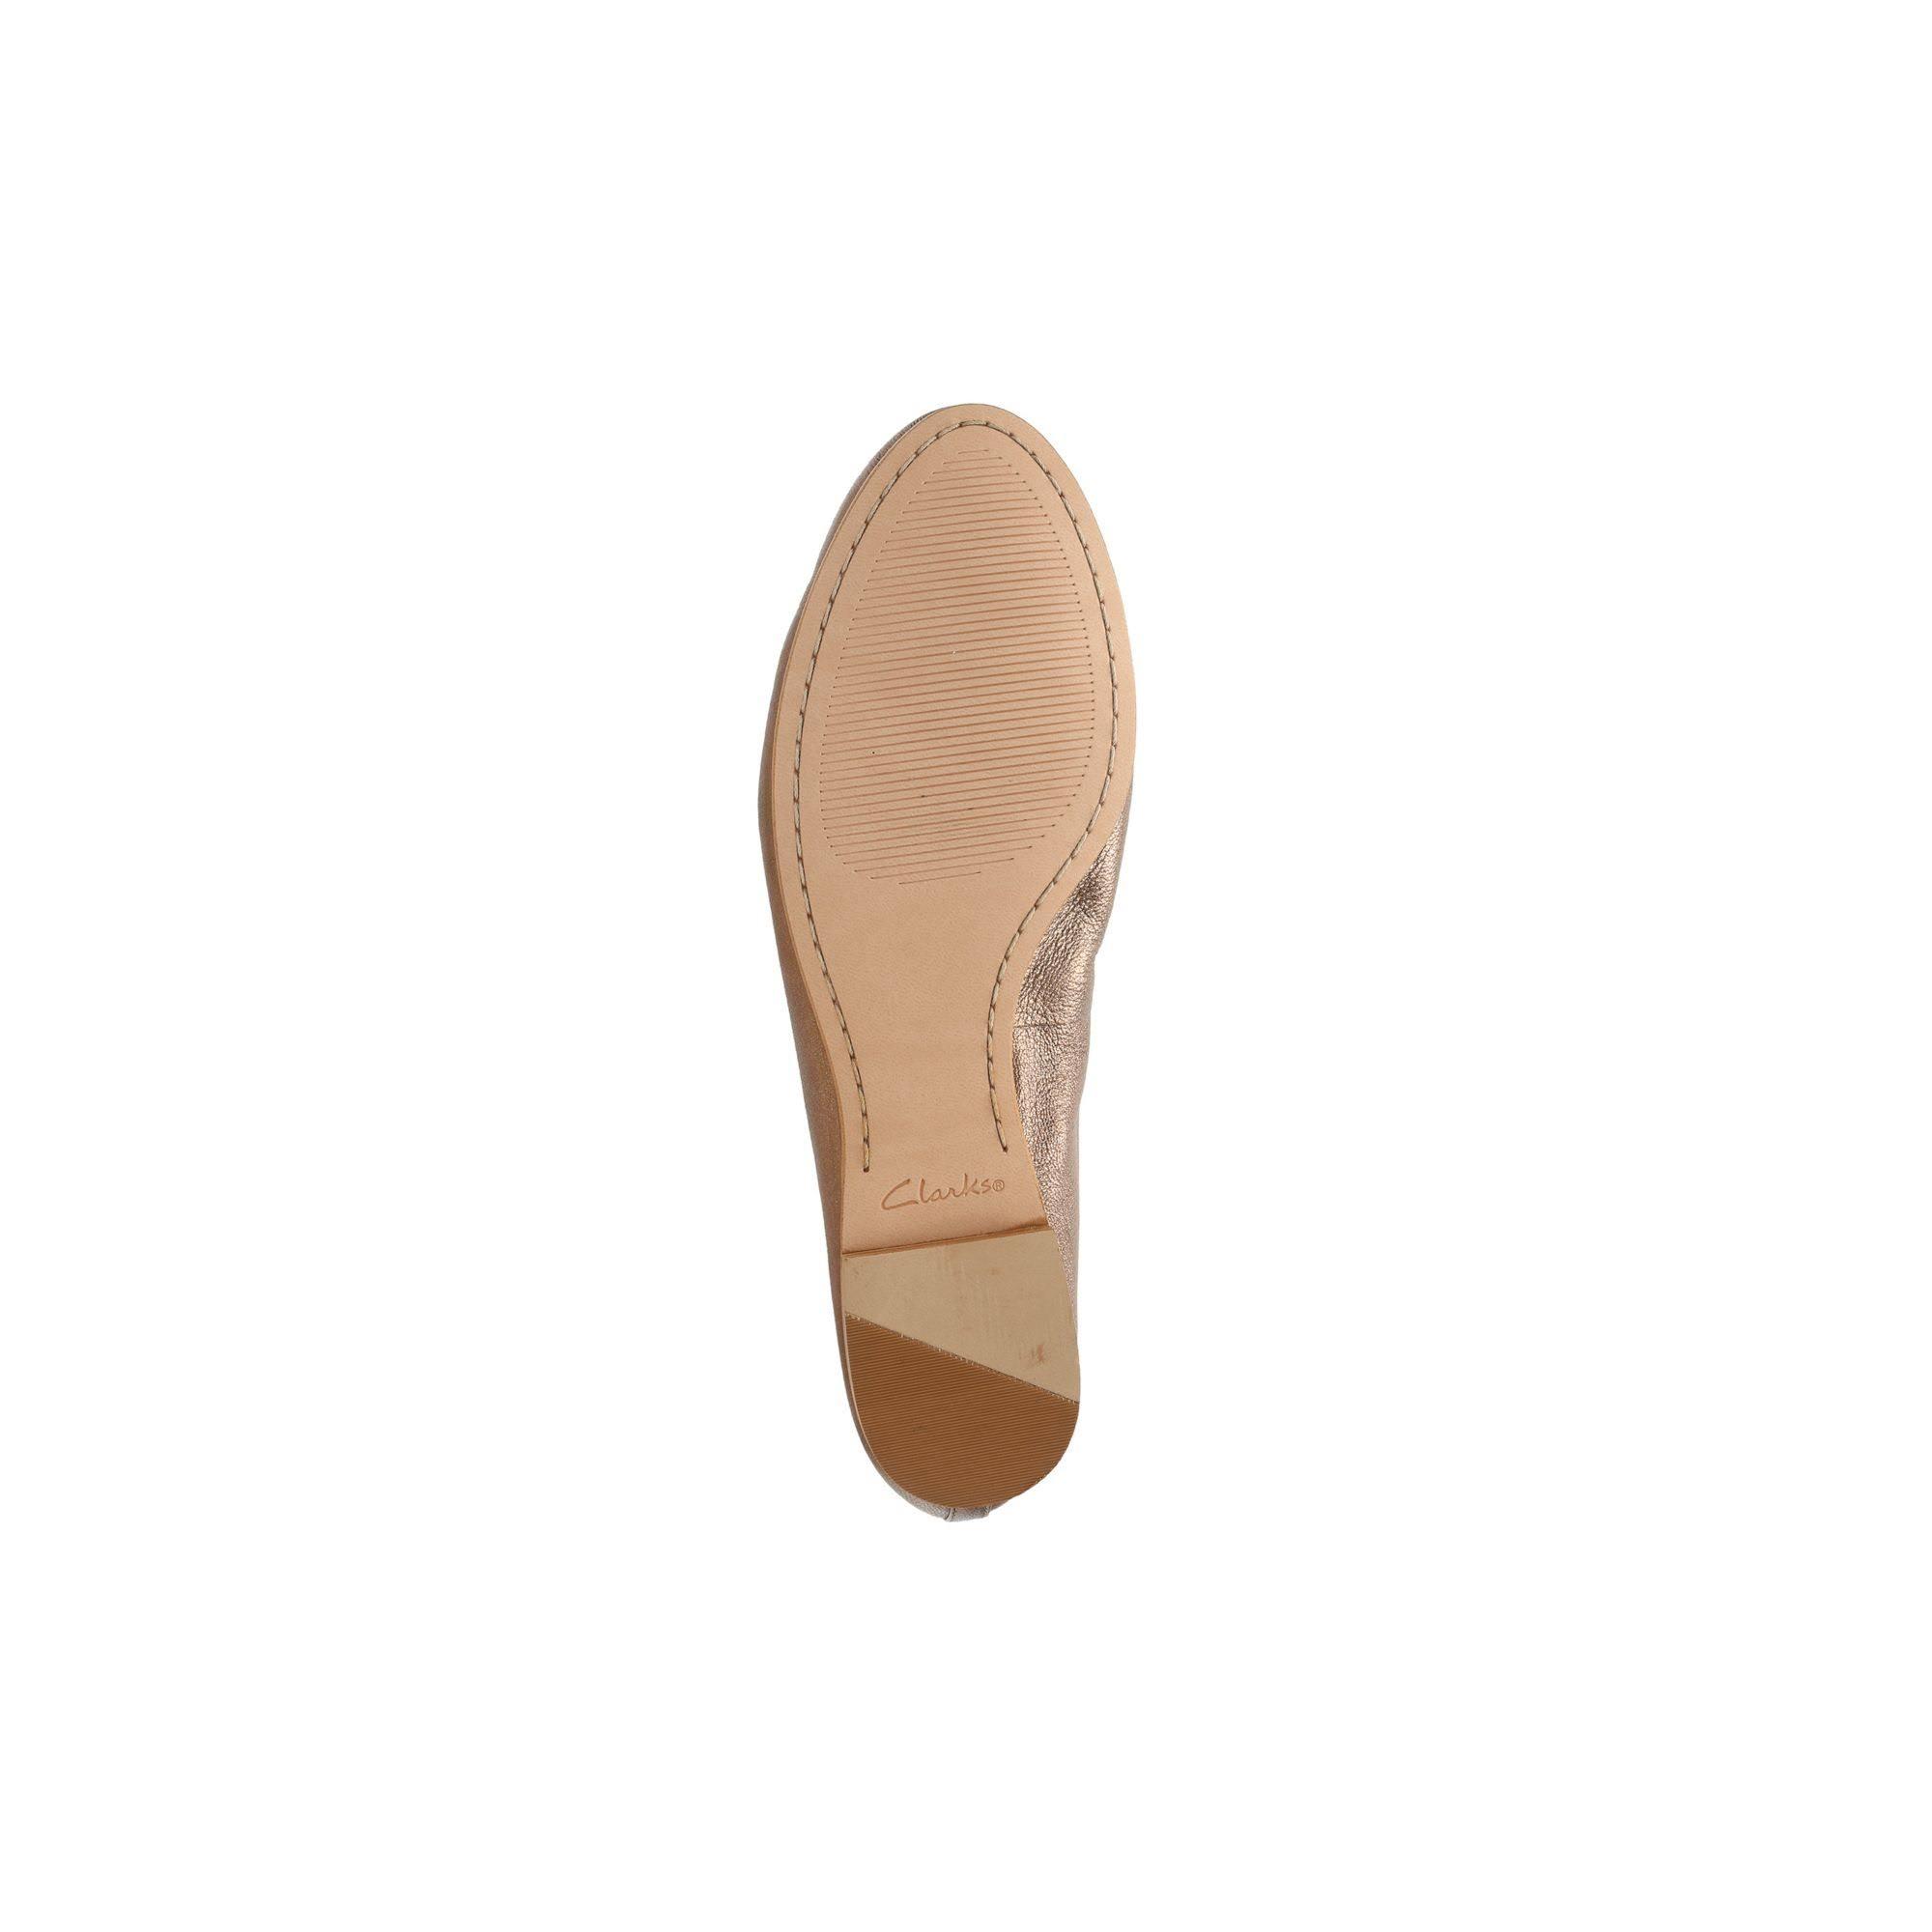 Bronze Gold Grace Clarks Mia Damen Ballerina KT3l1cJF